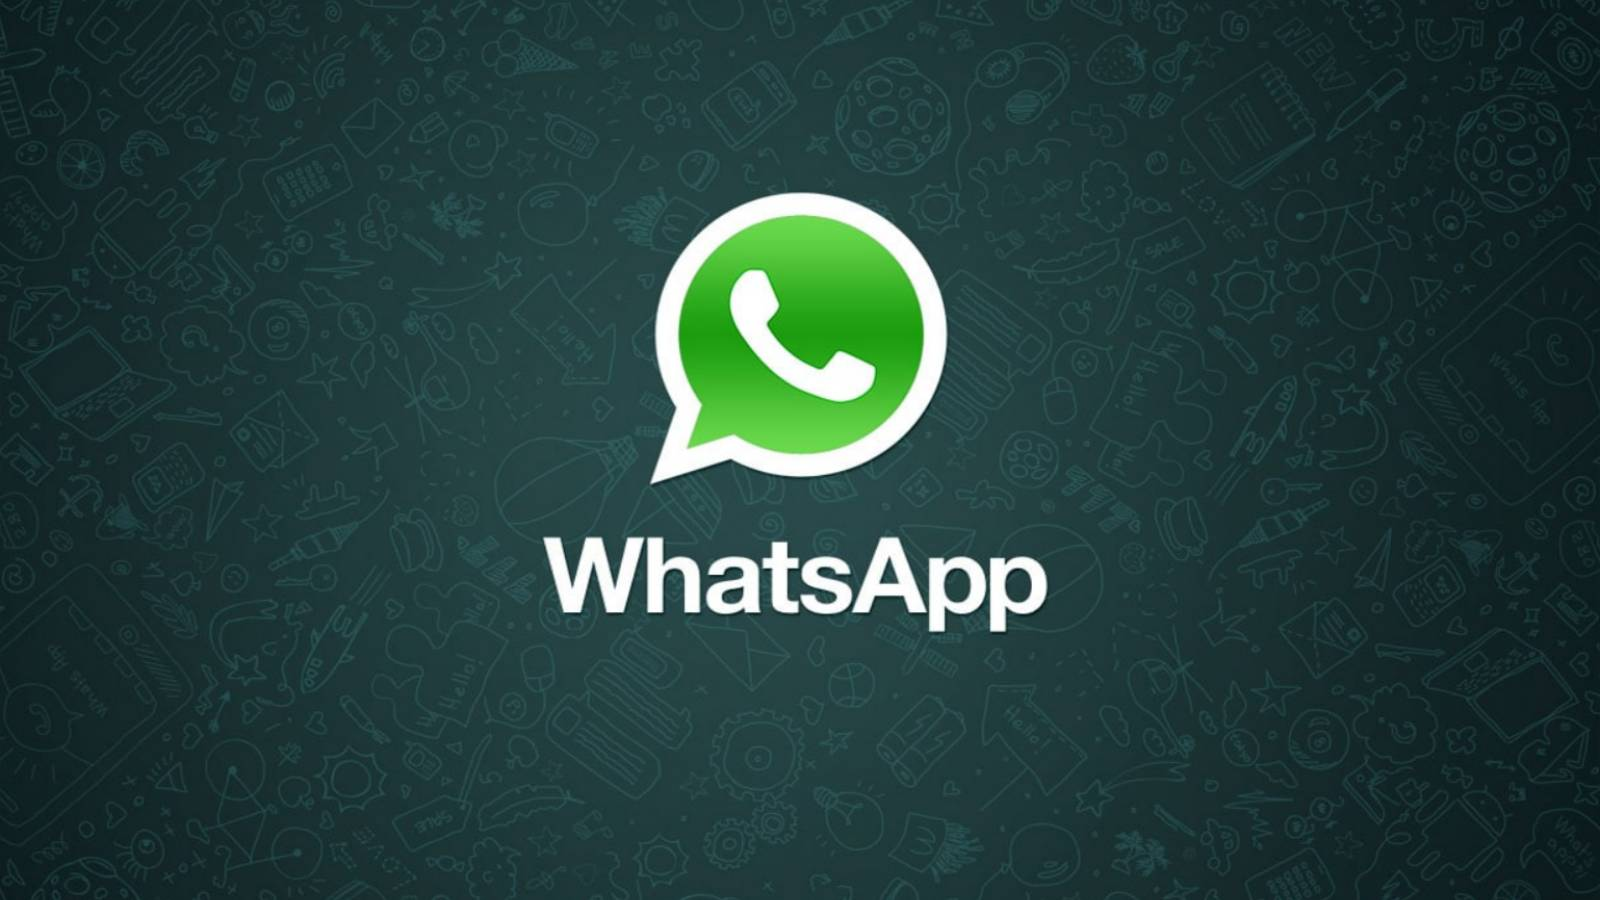 WhatsApp enclava